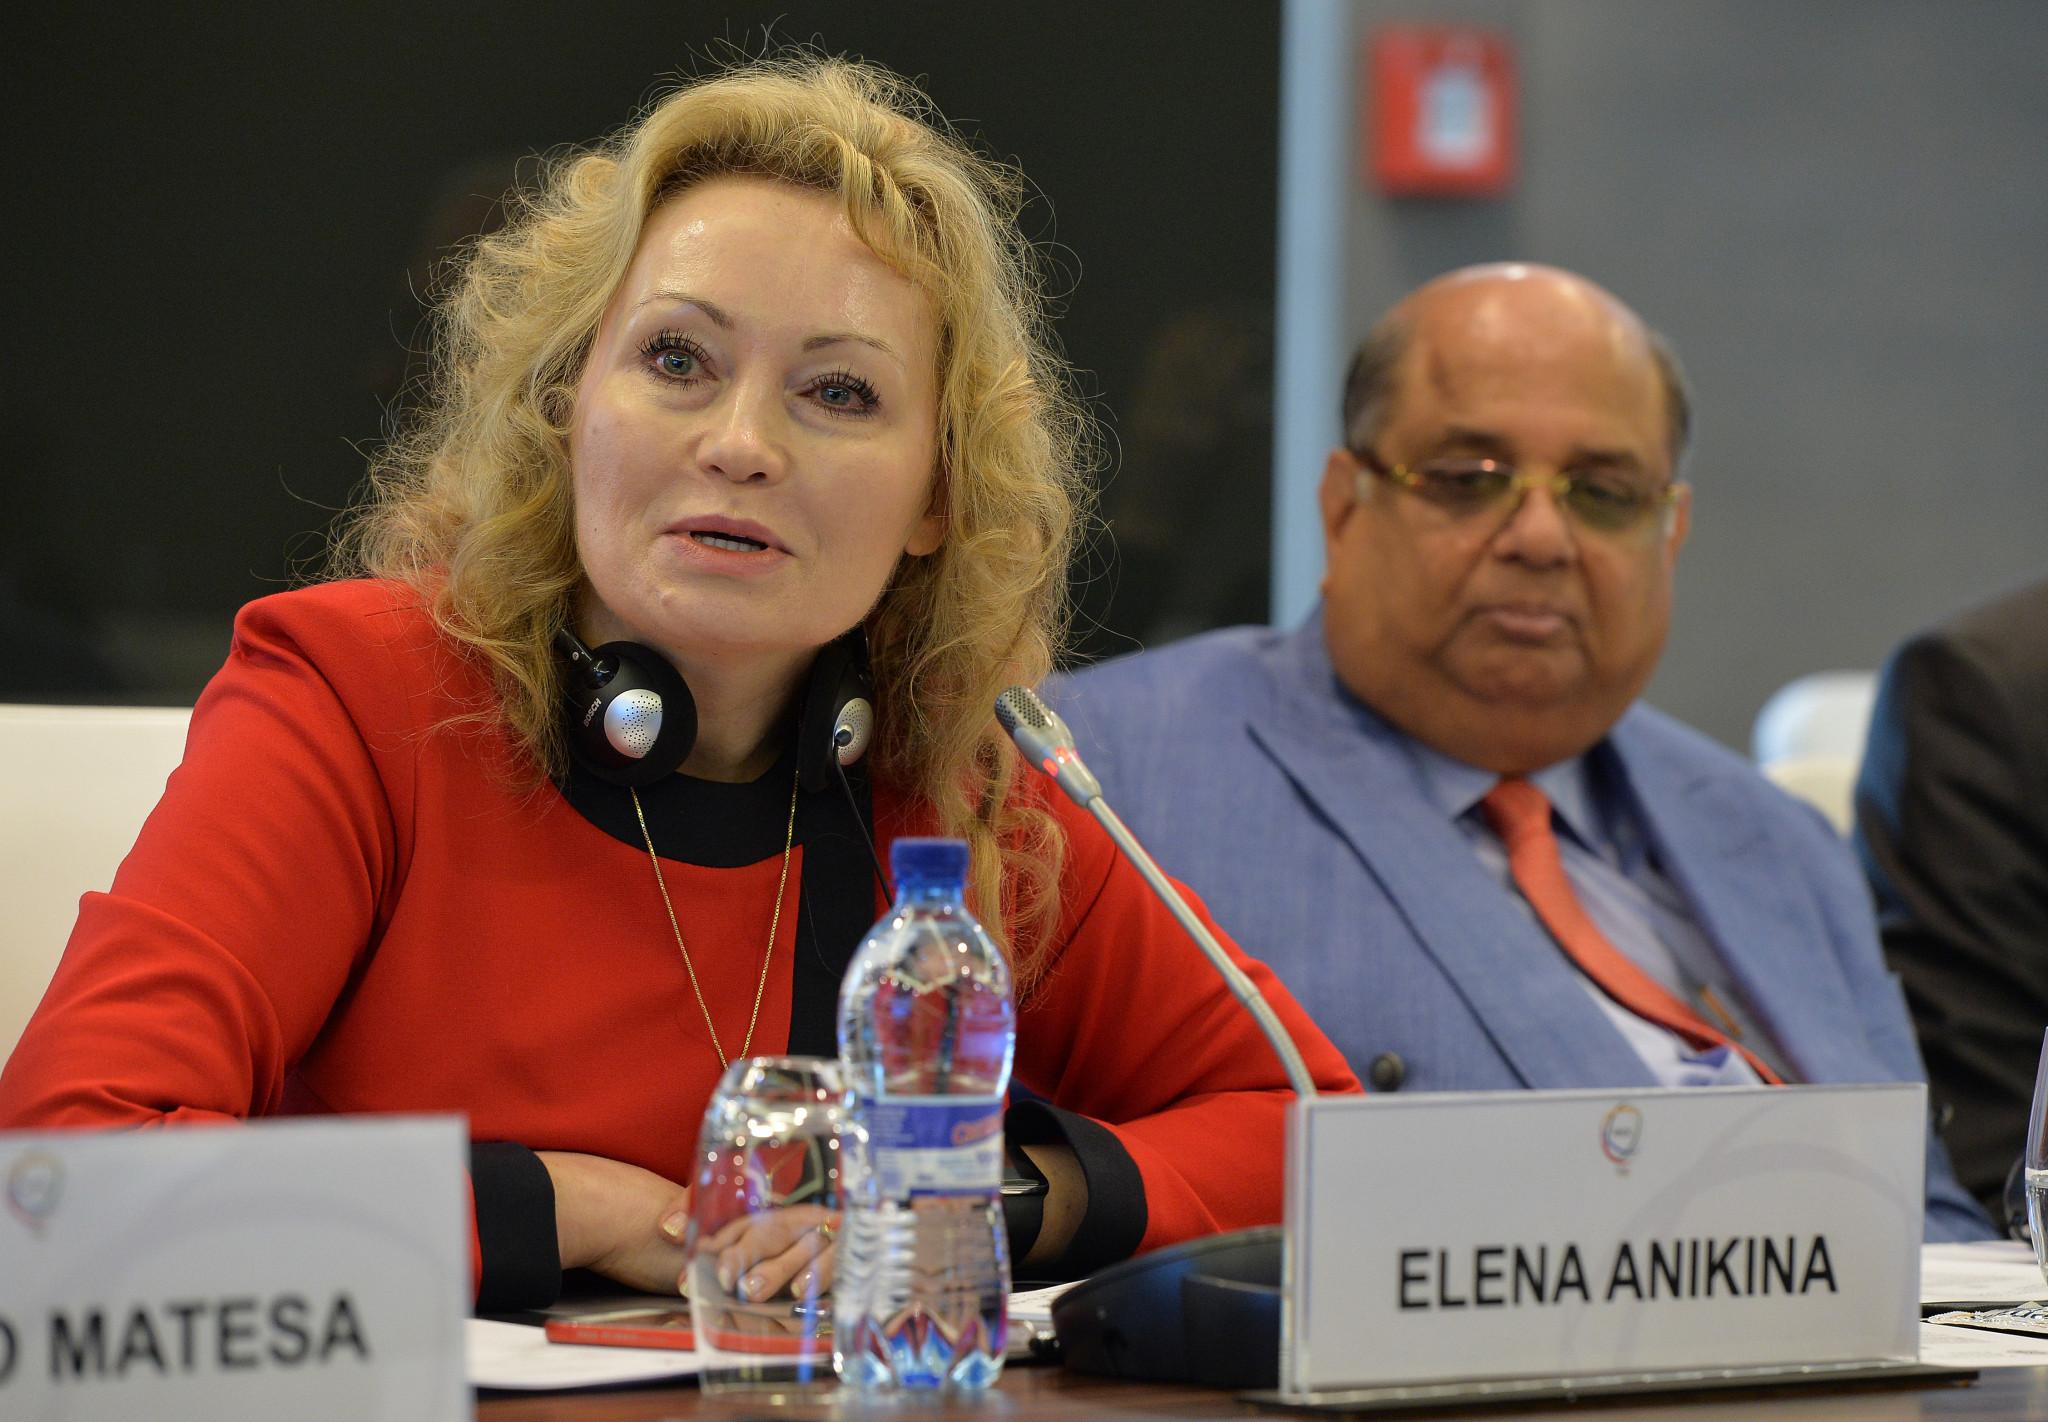 RBF President Elena Anikina said Oleg Sokolov had created an unhealthy culture in the sport ©Getty Images